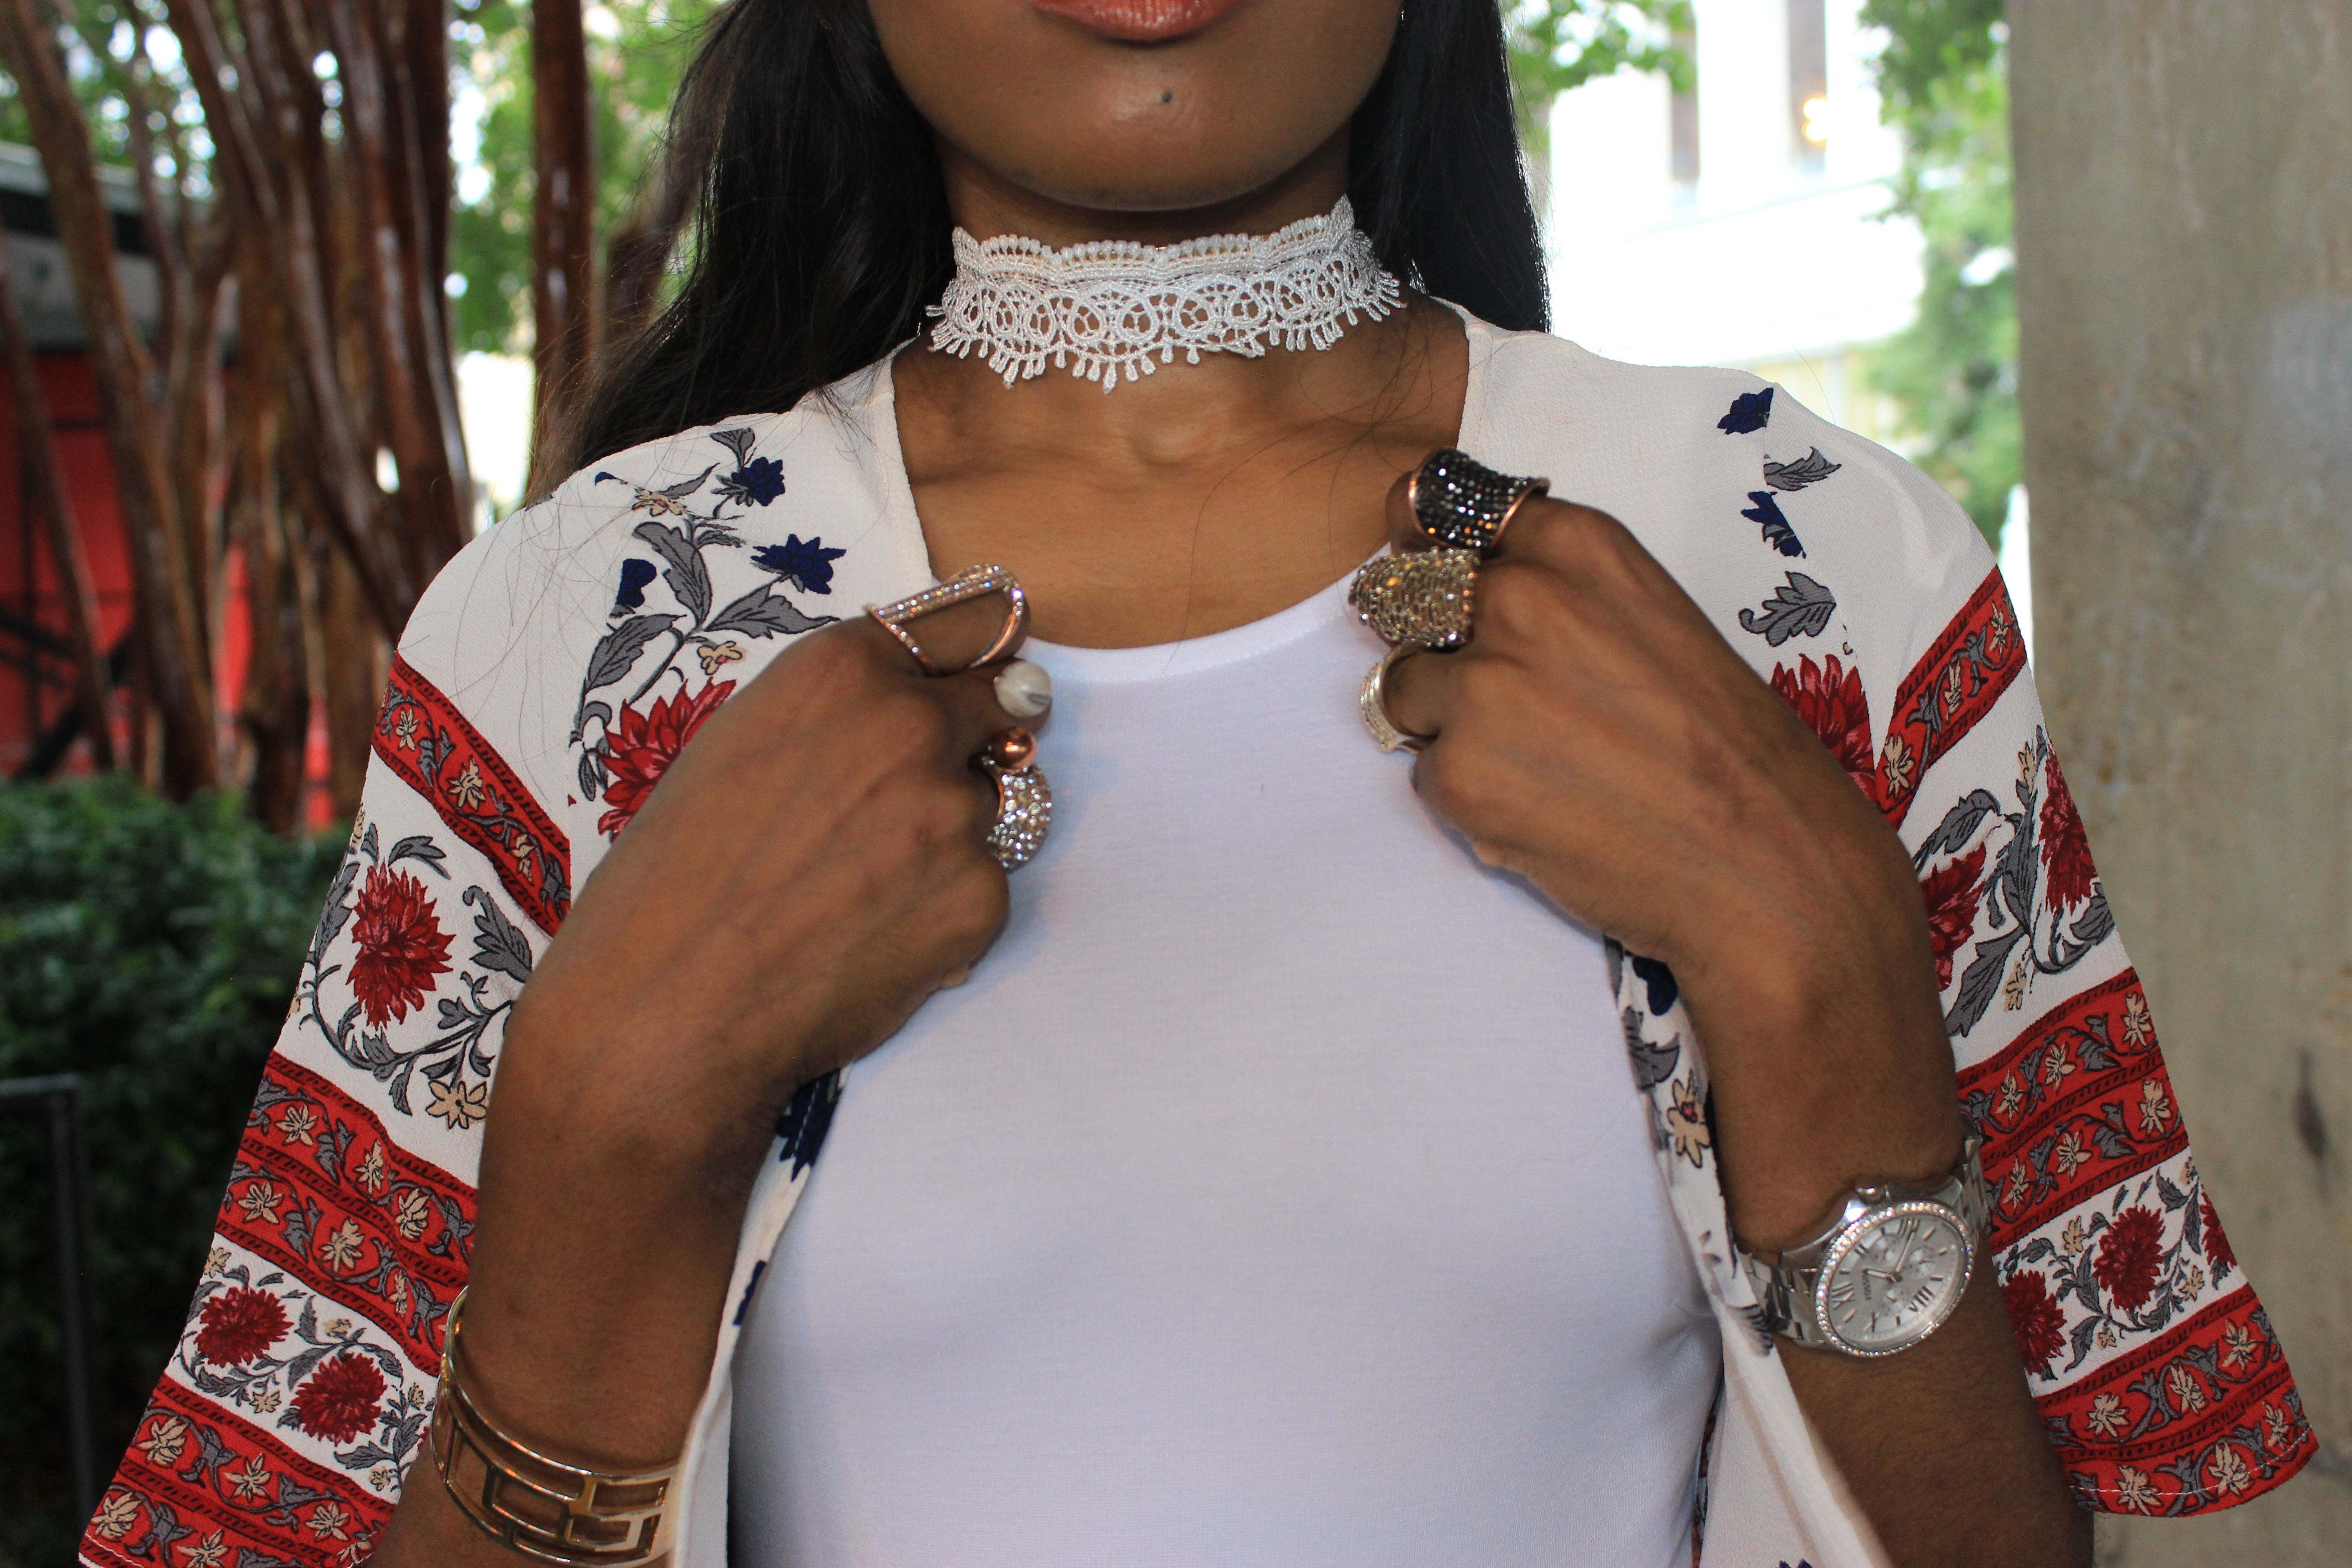 Style-Files-White-forever21-sleeveless-dress-boohoo-Lucy Border Print Maxi Shortsleeve Kimono-Boohoo-ruby-Scalloped Lace Choker-Public-desire-red-lace-uP-heels-forever-21-daisy-headband-oohlalablog-6